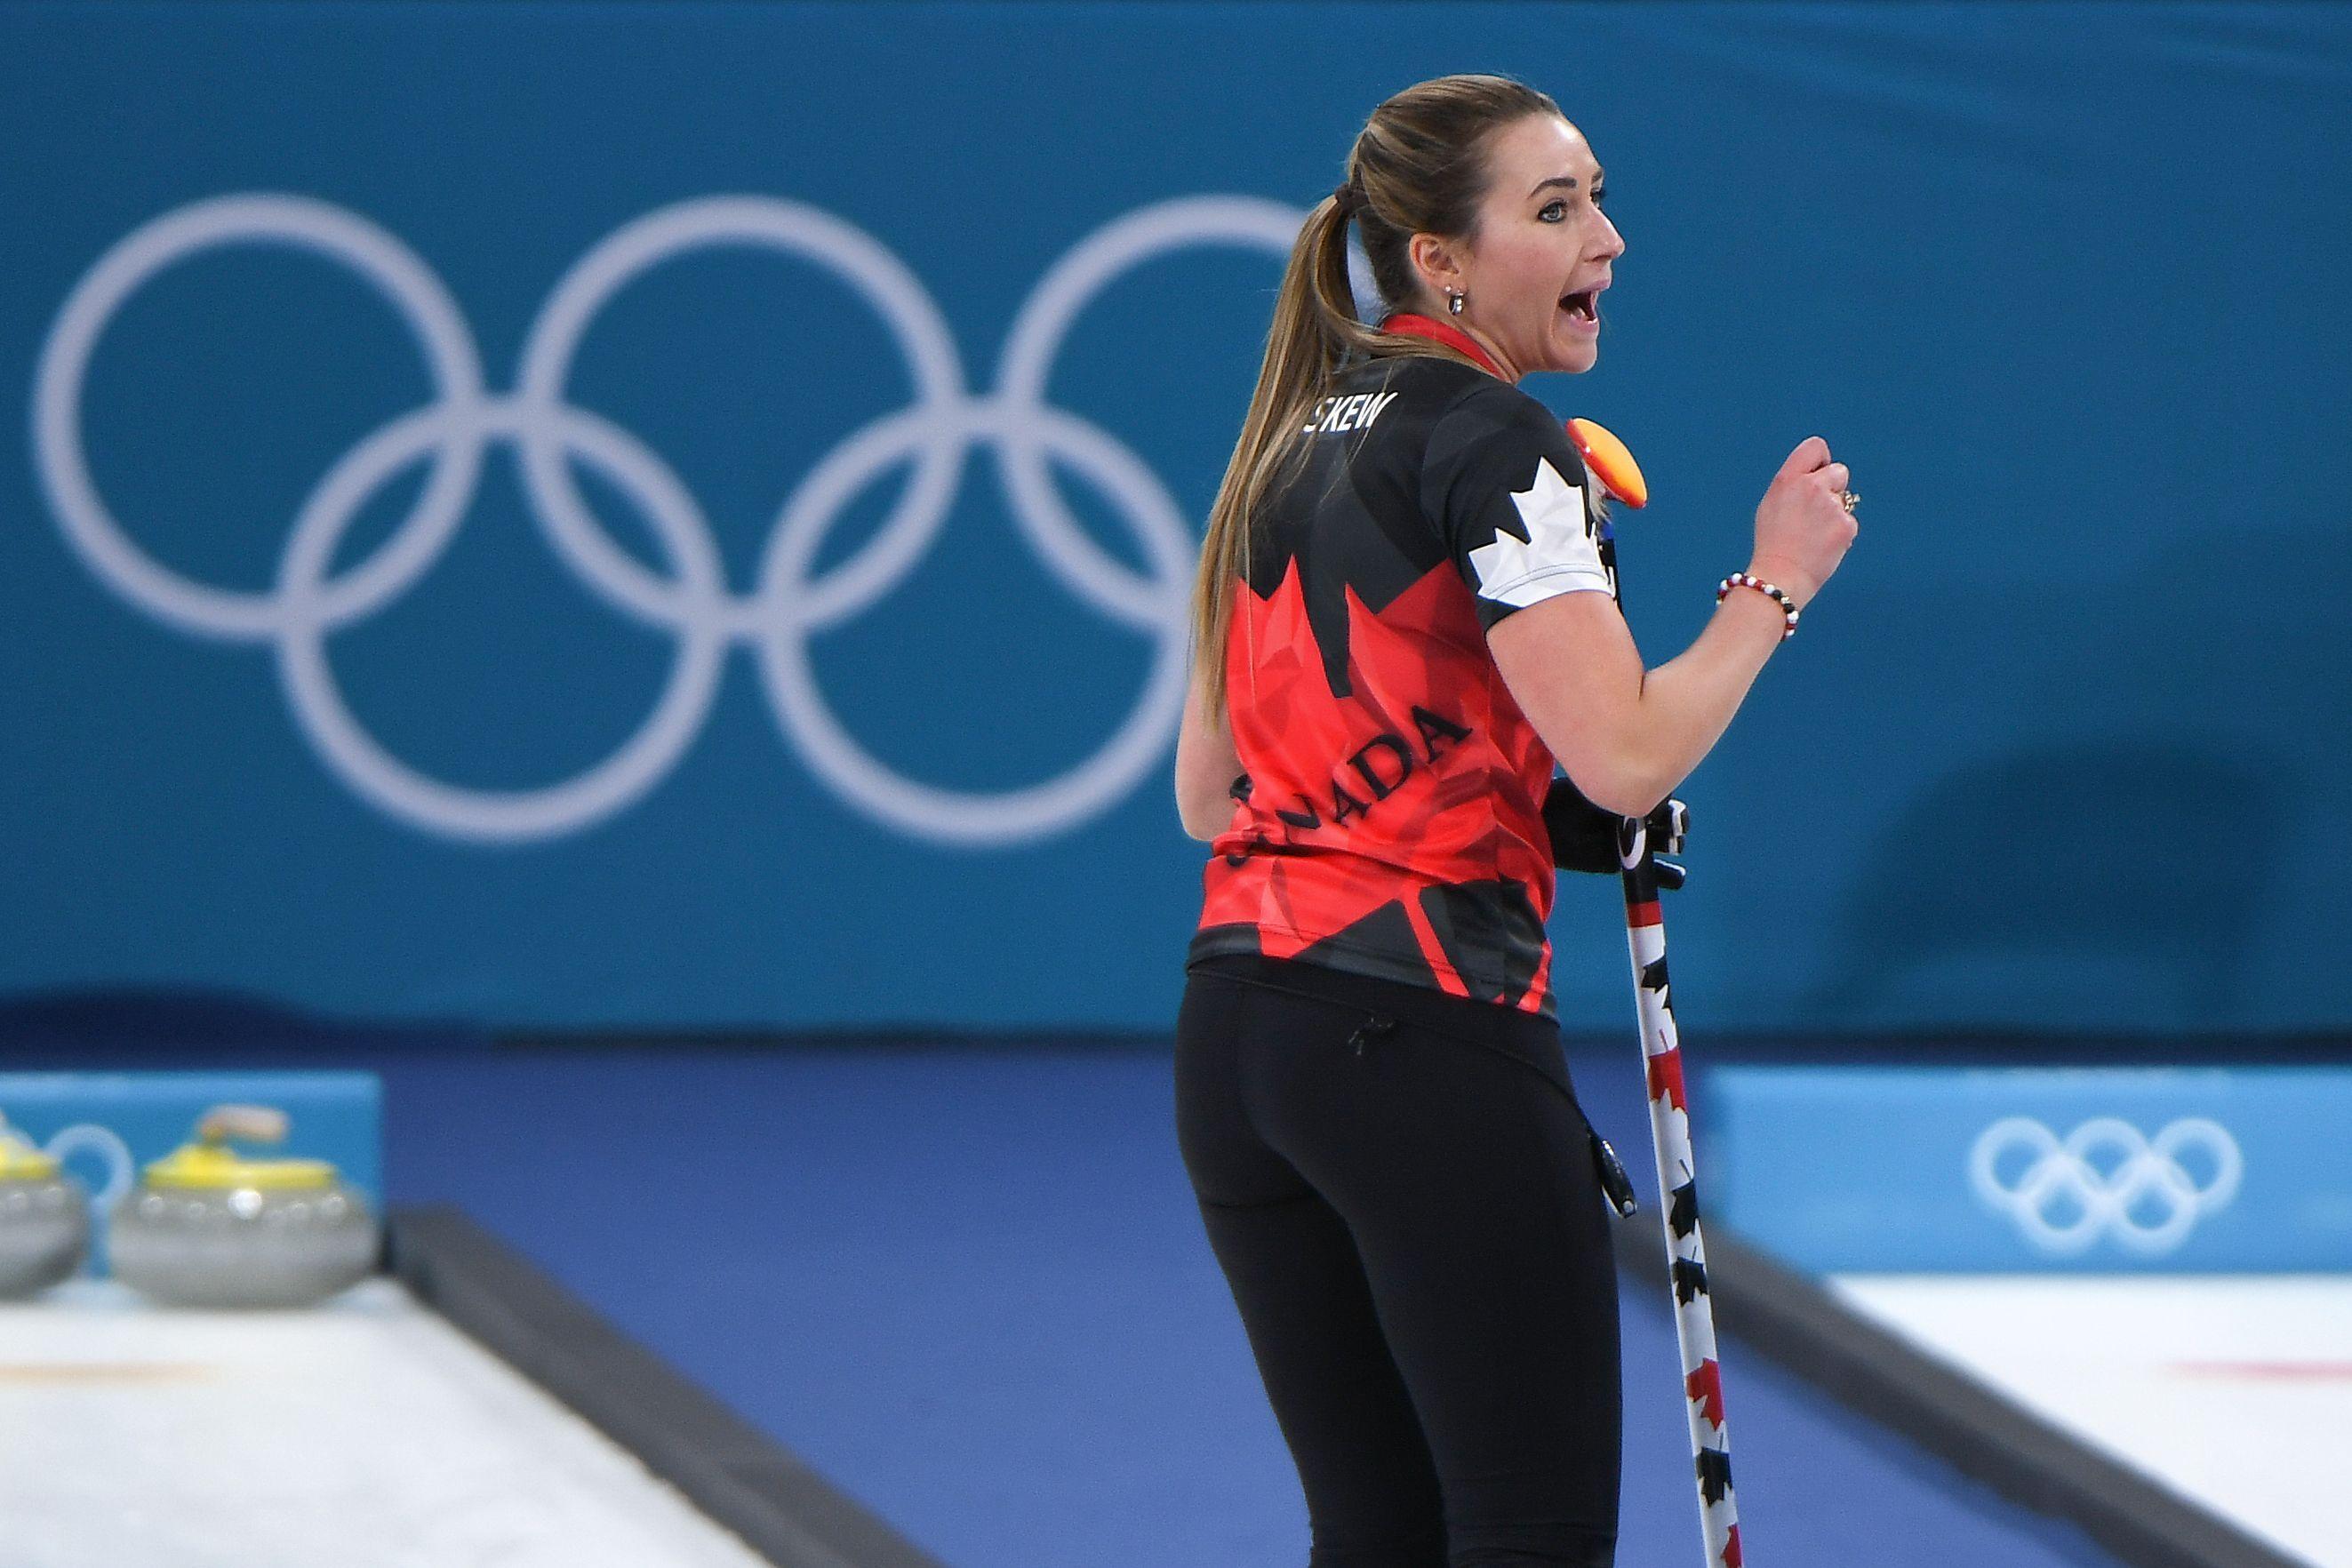 Olympics Live Stream: Watch Women's Curling Denmark Vs